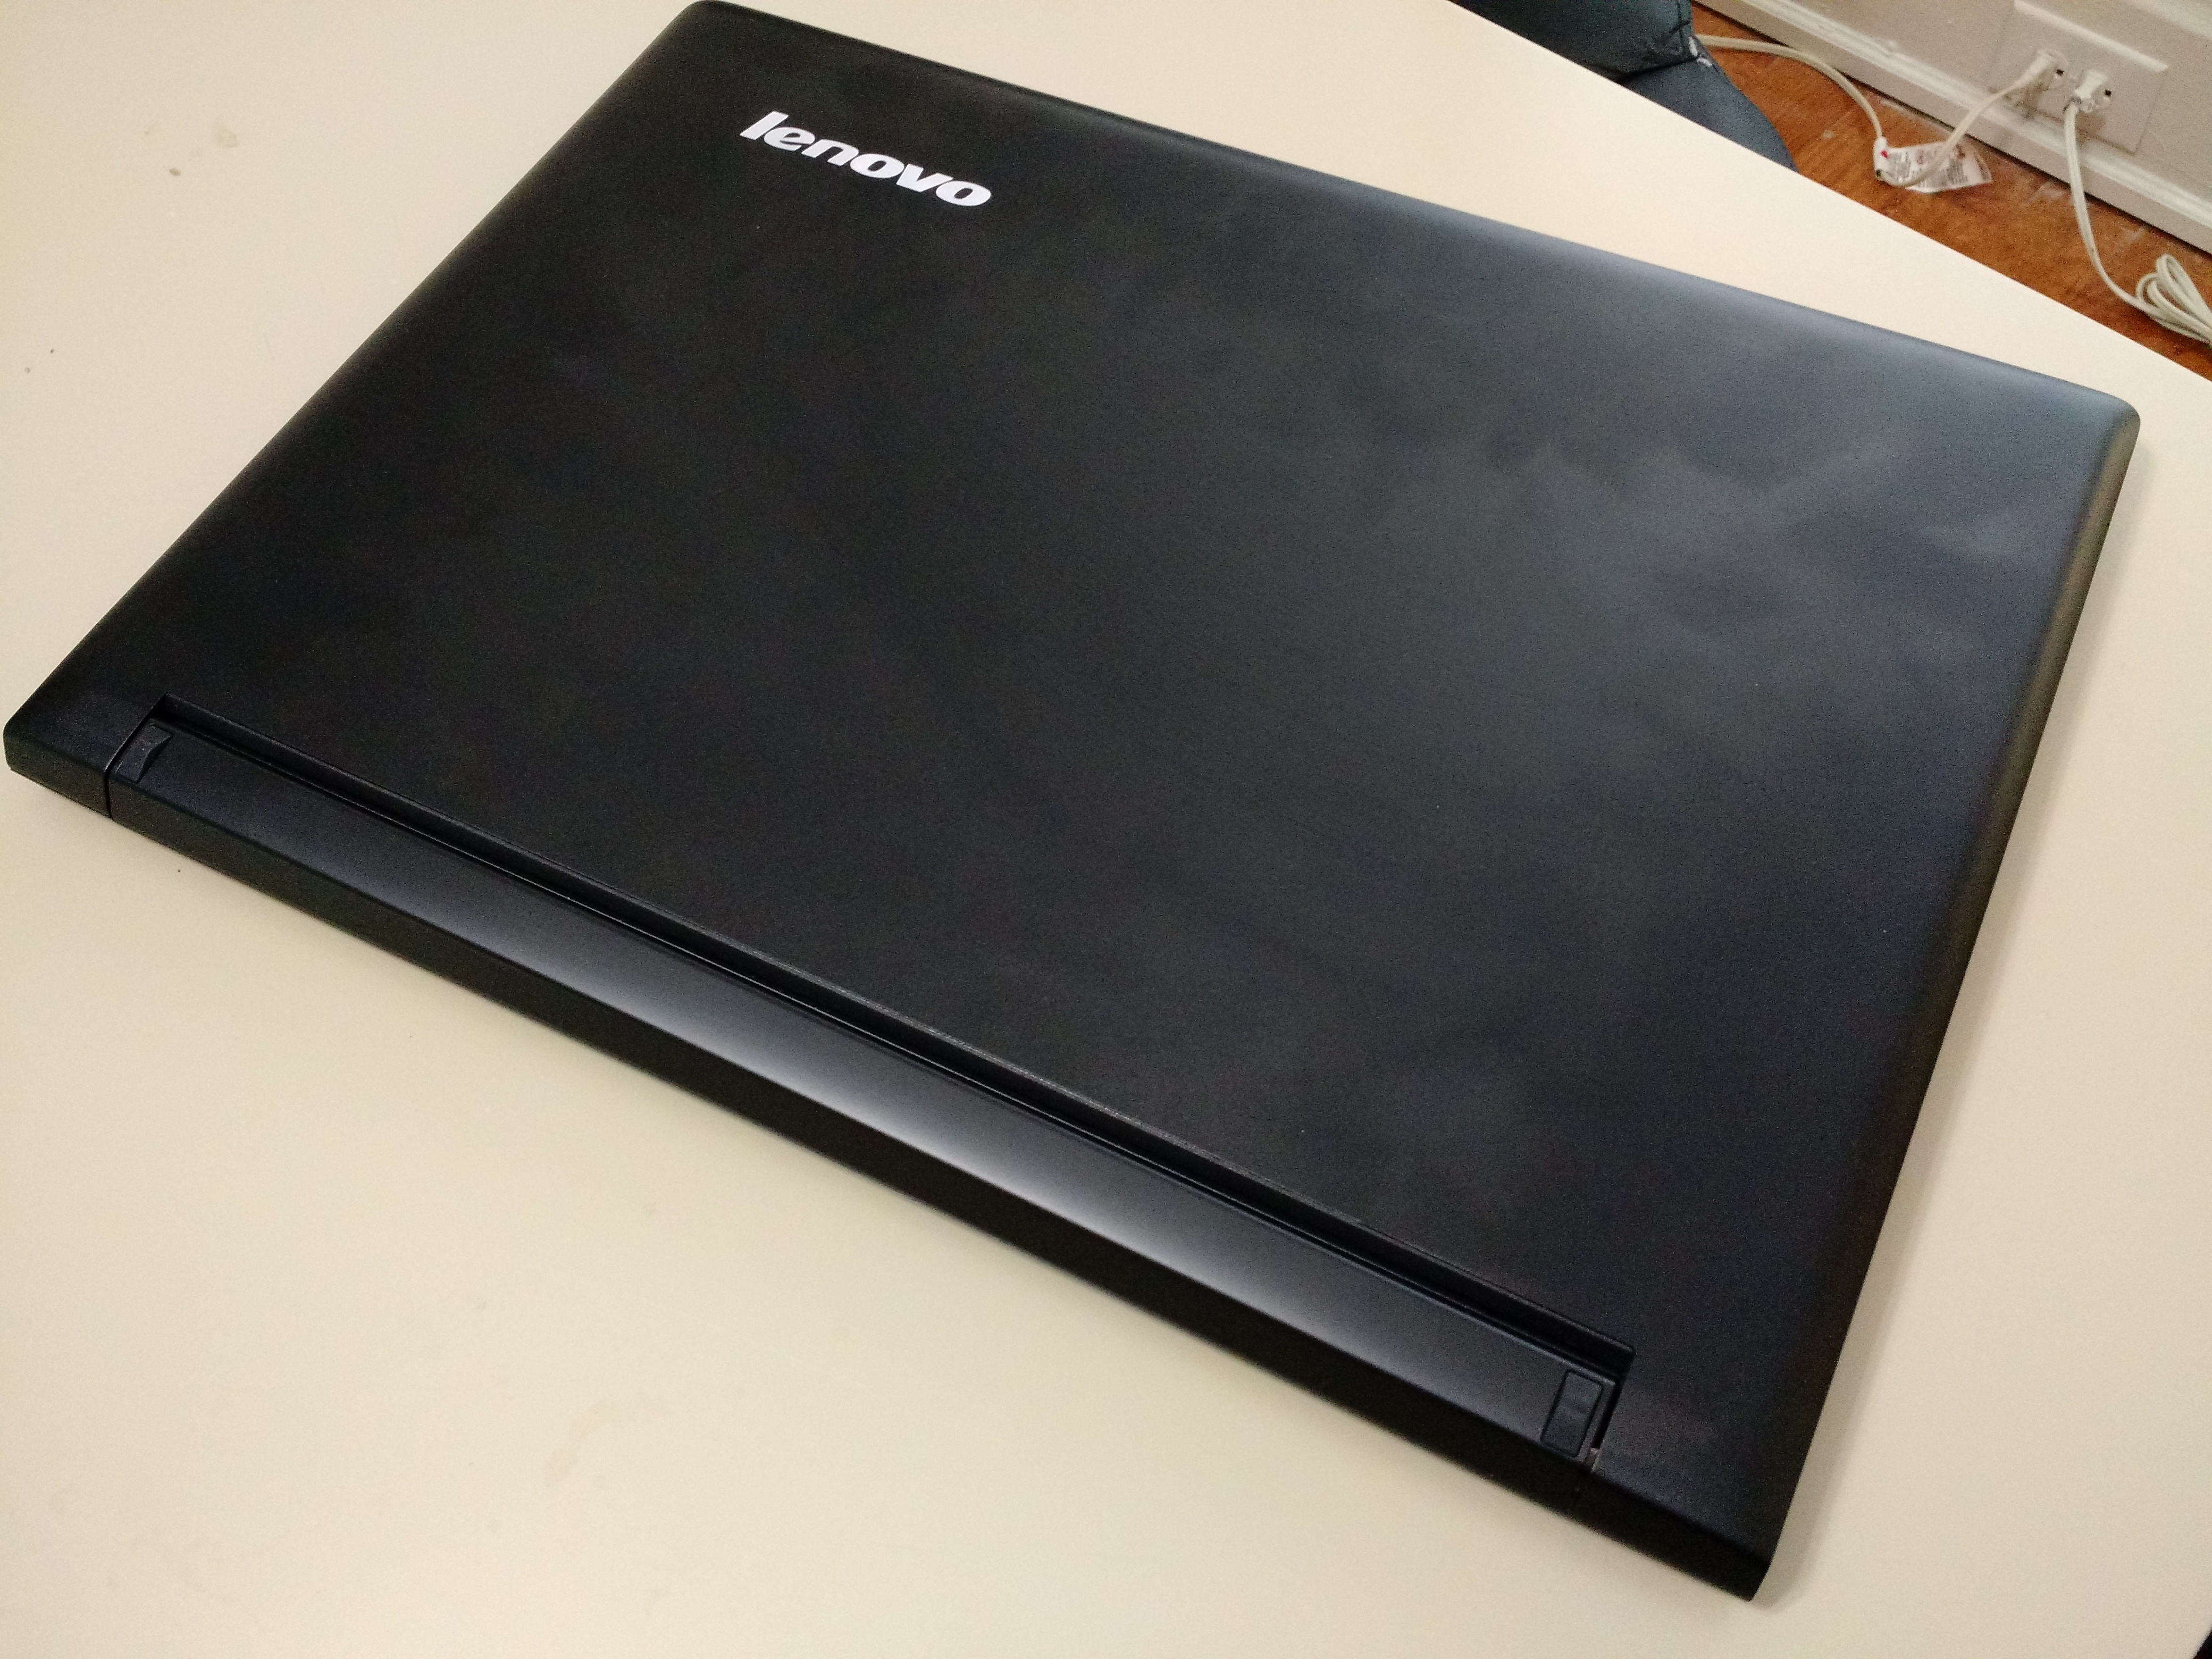 Lenovo Edge 15 Review